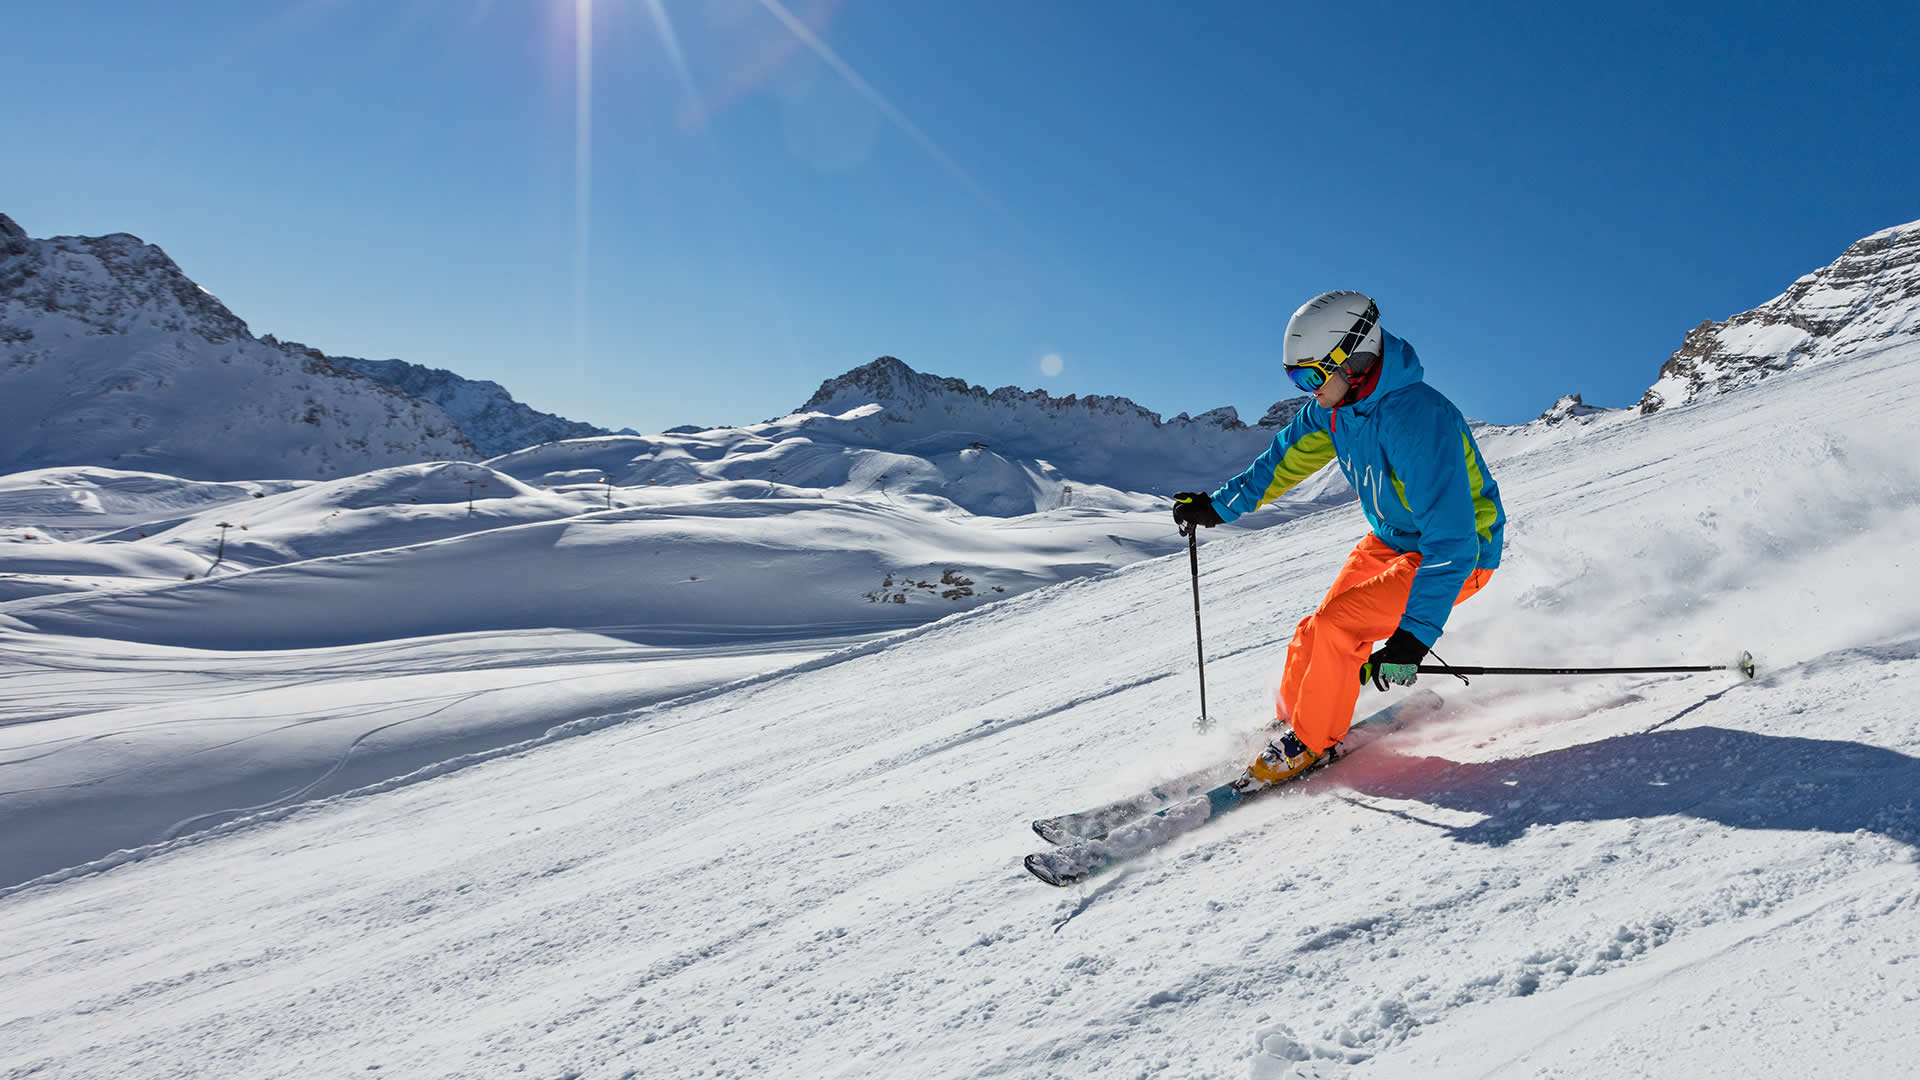 Ski Instructor Training Courses Gap Year Ski Season Oyster Worldwide